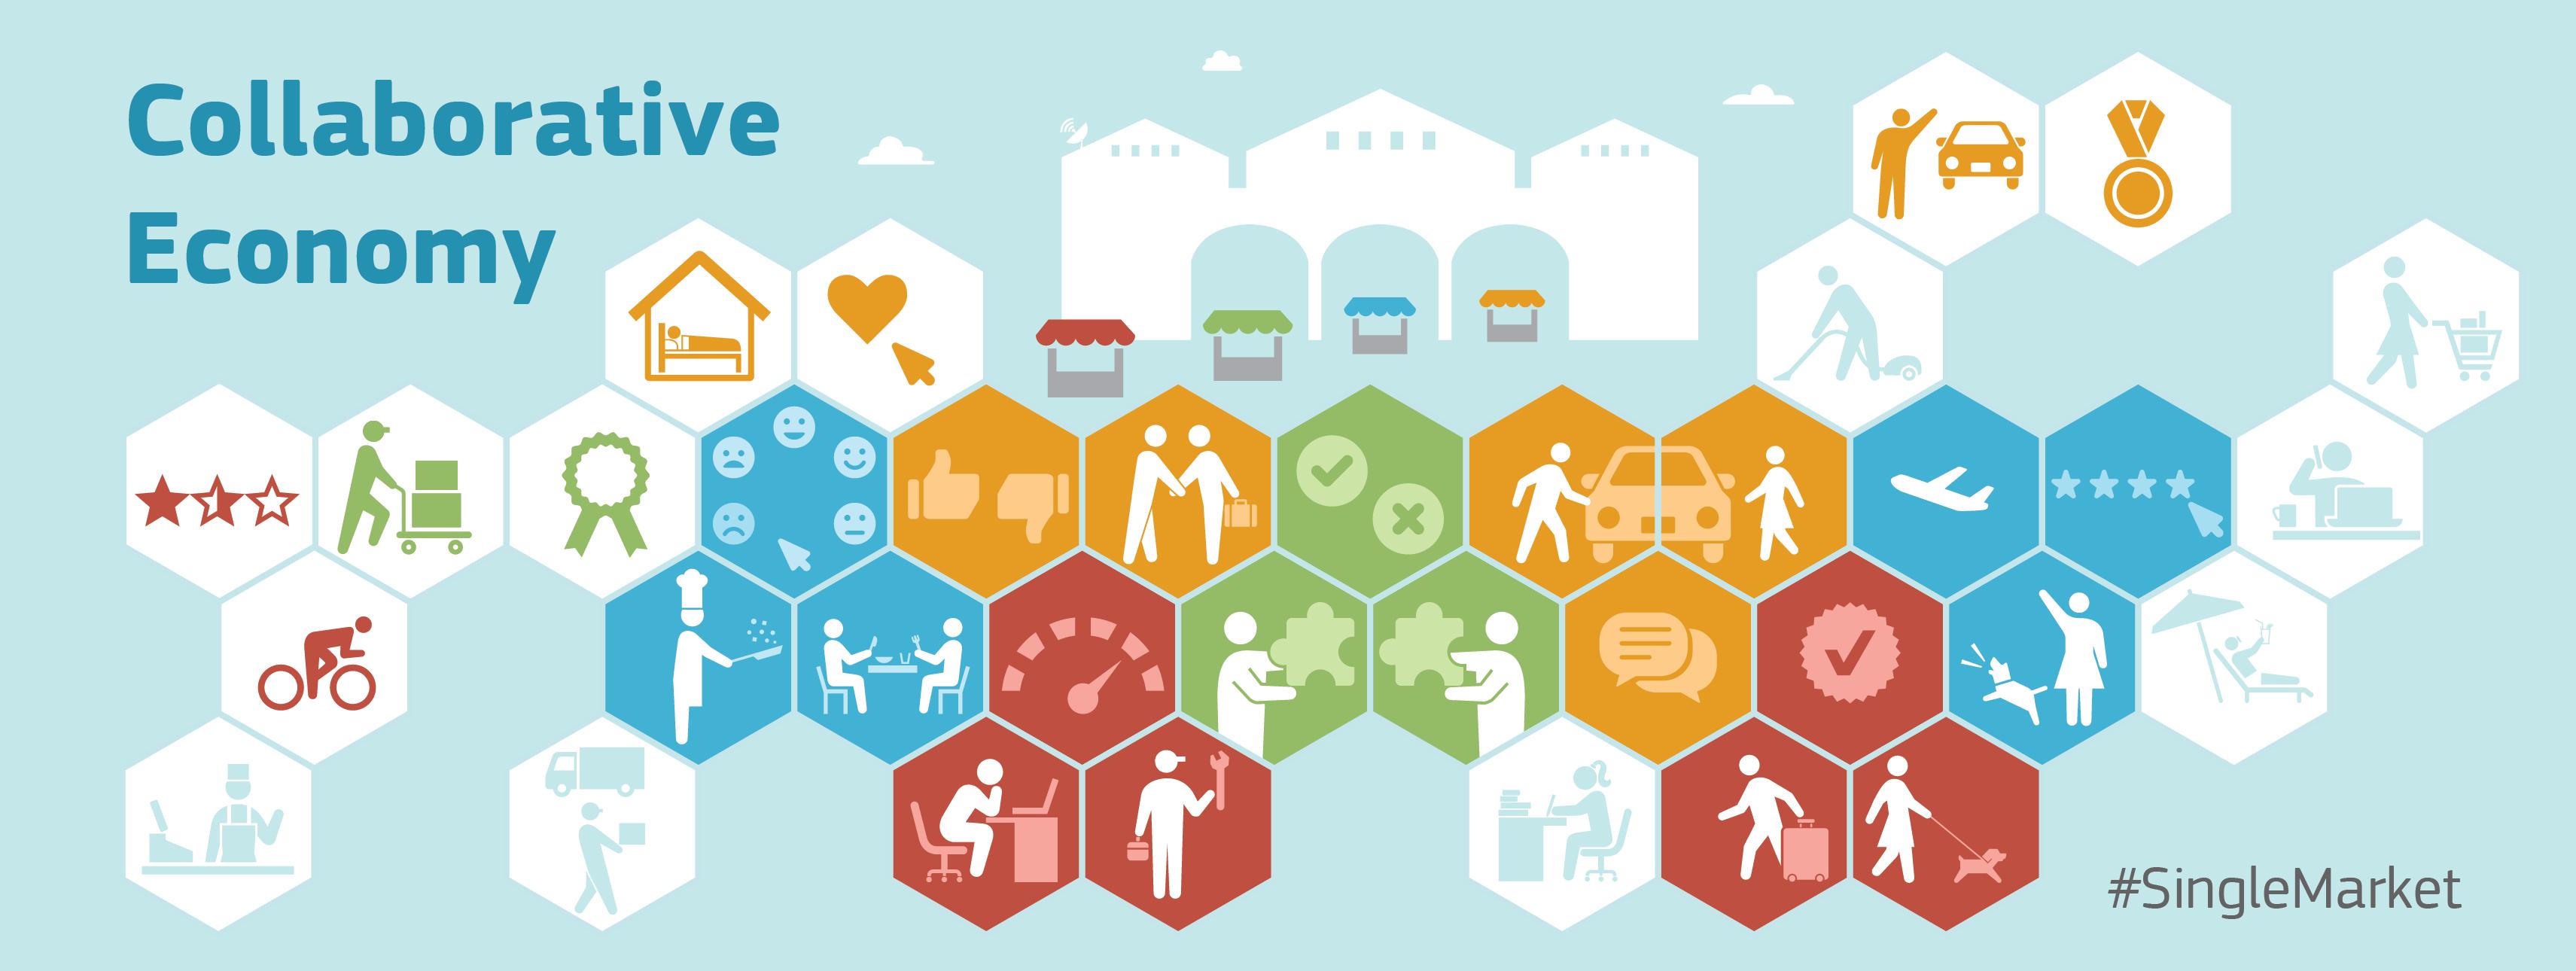 Collaborative Economy, Digital Economy, European Commission, URBACT